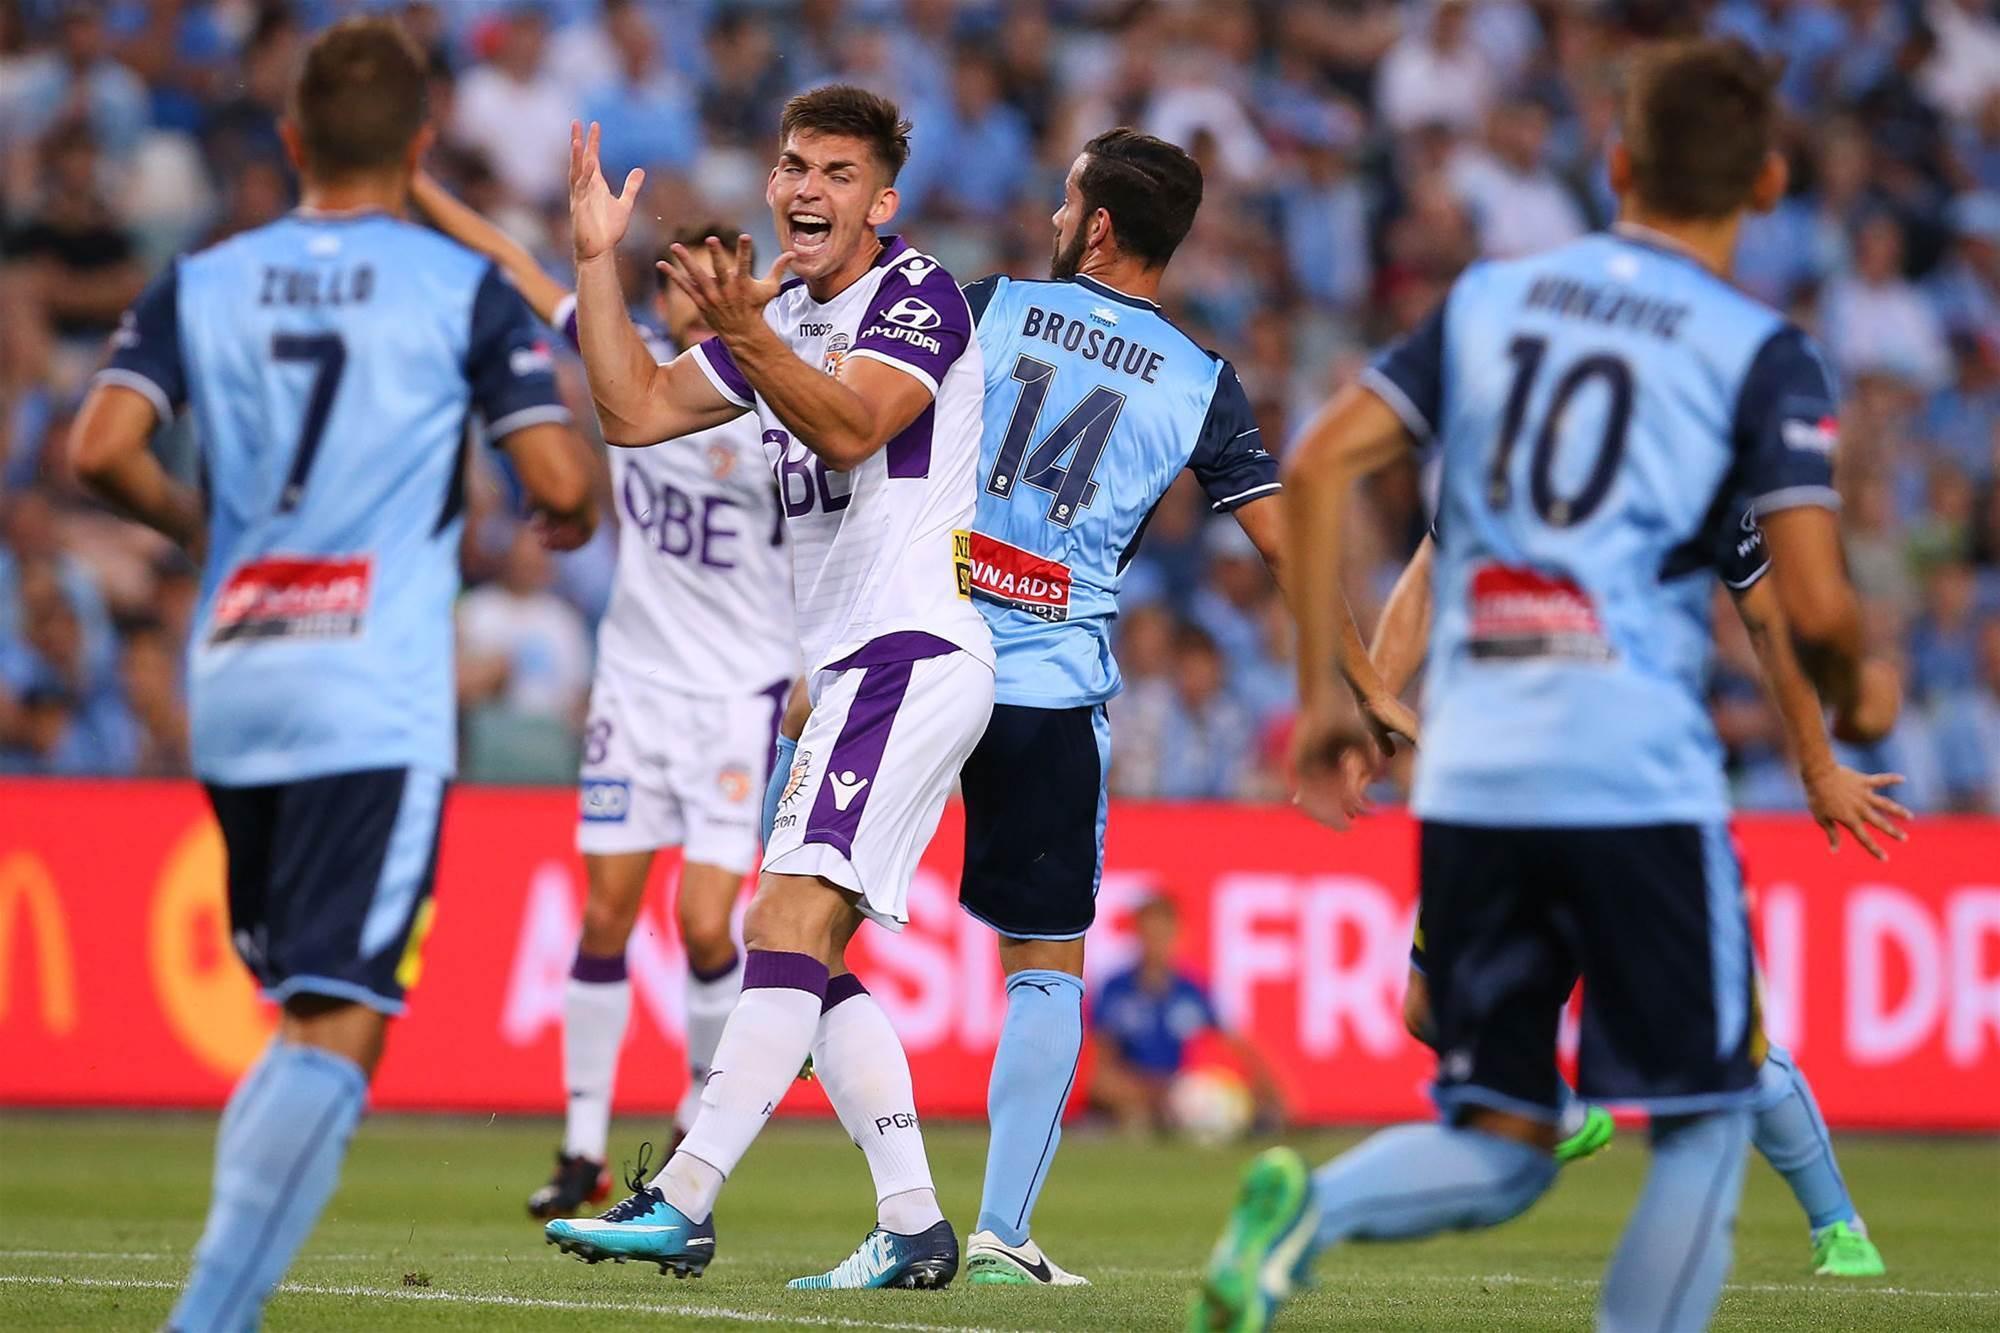 Sydney FC v Perth Glory player ratings